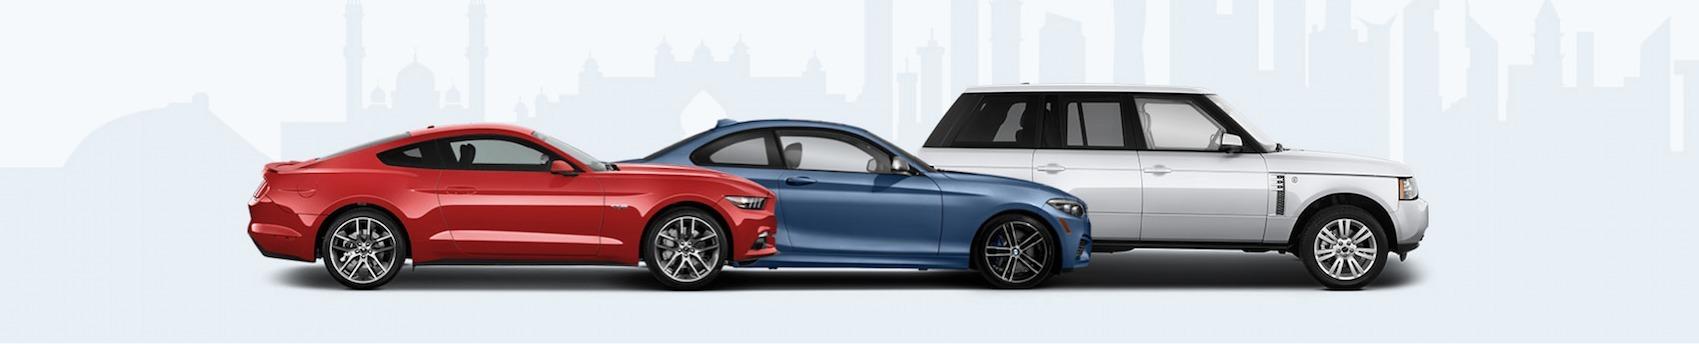 Quick Lease Car Rental (@quickleaseae) Cover Image